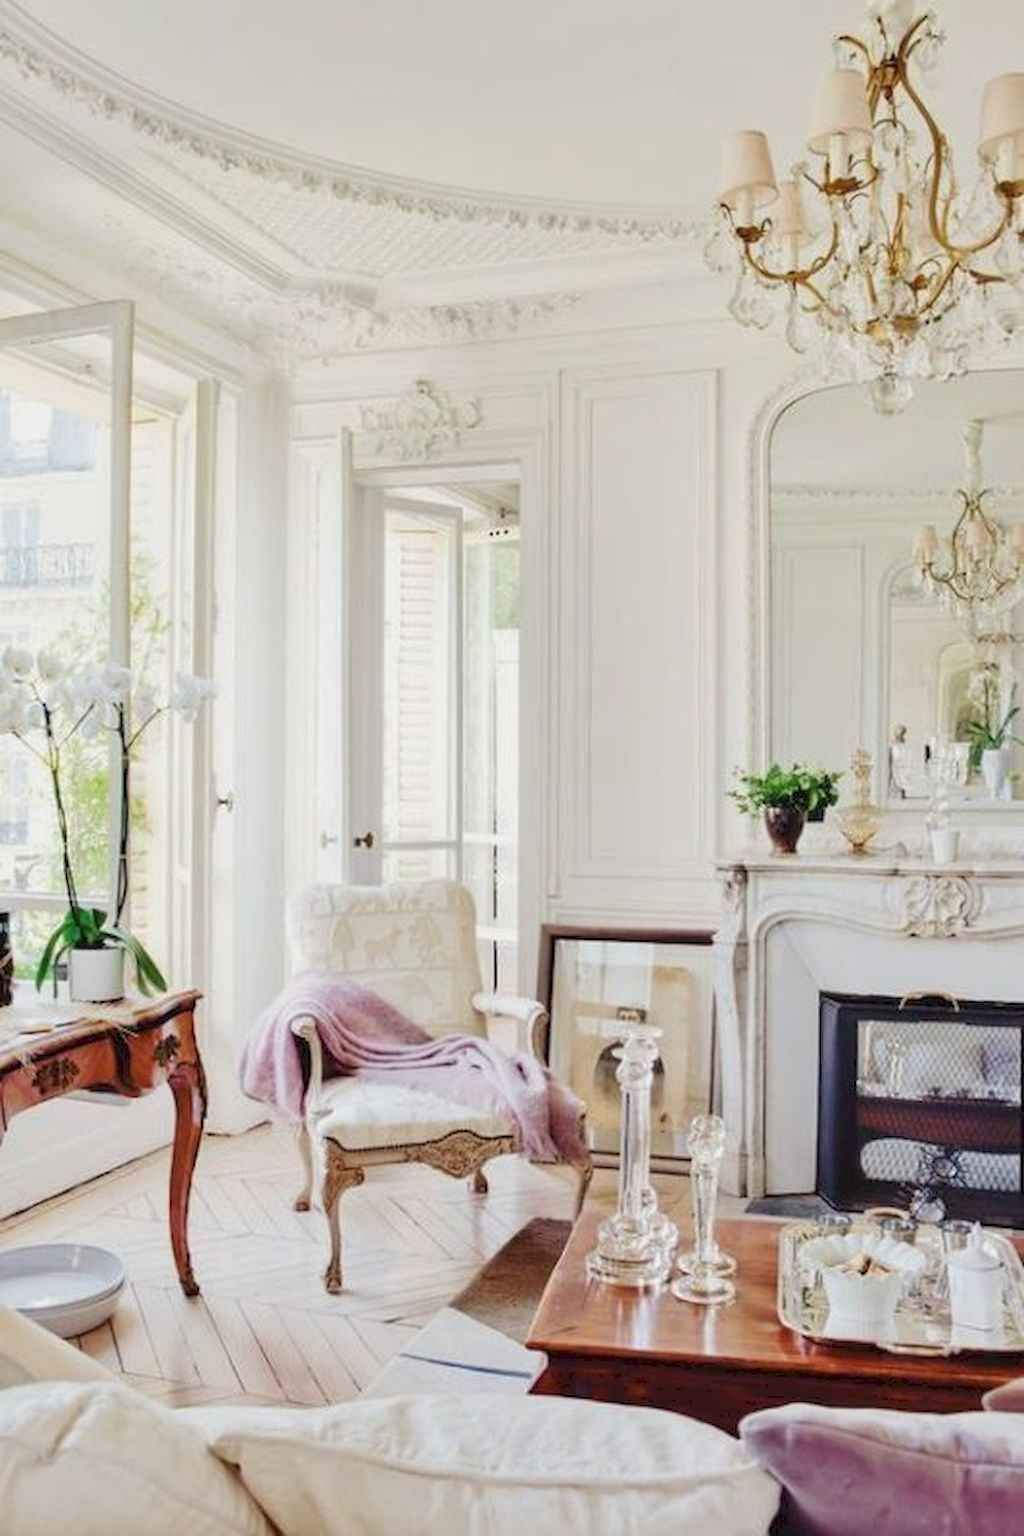 111 Awesome Parisian Chic Apartment Decor Ideas 90 Chic